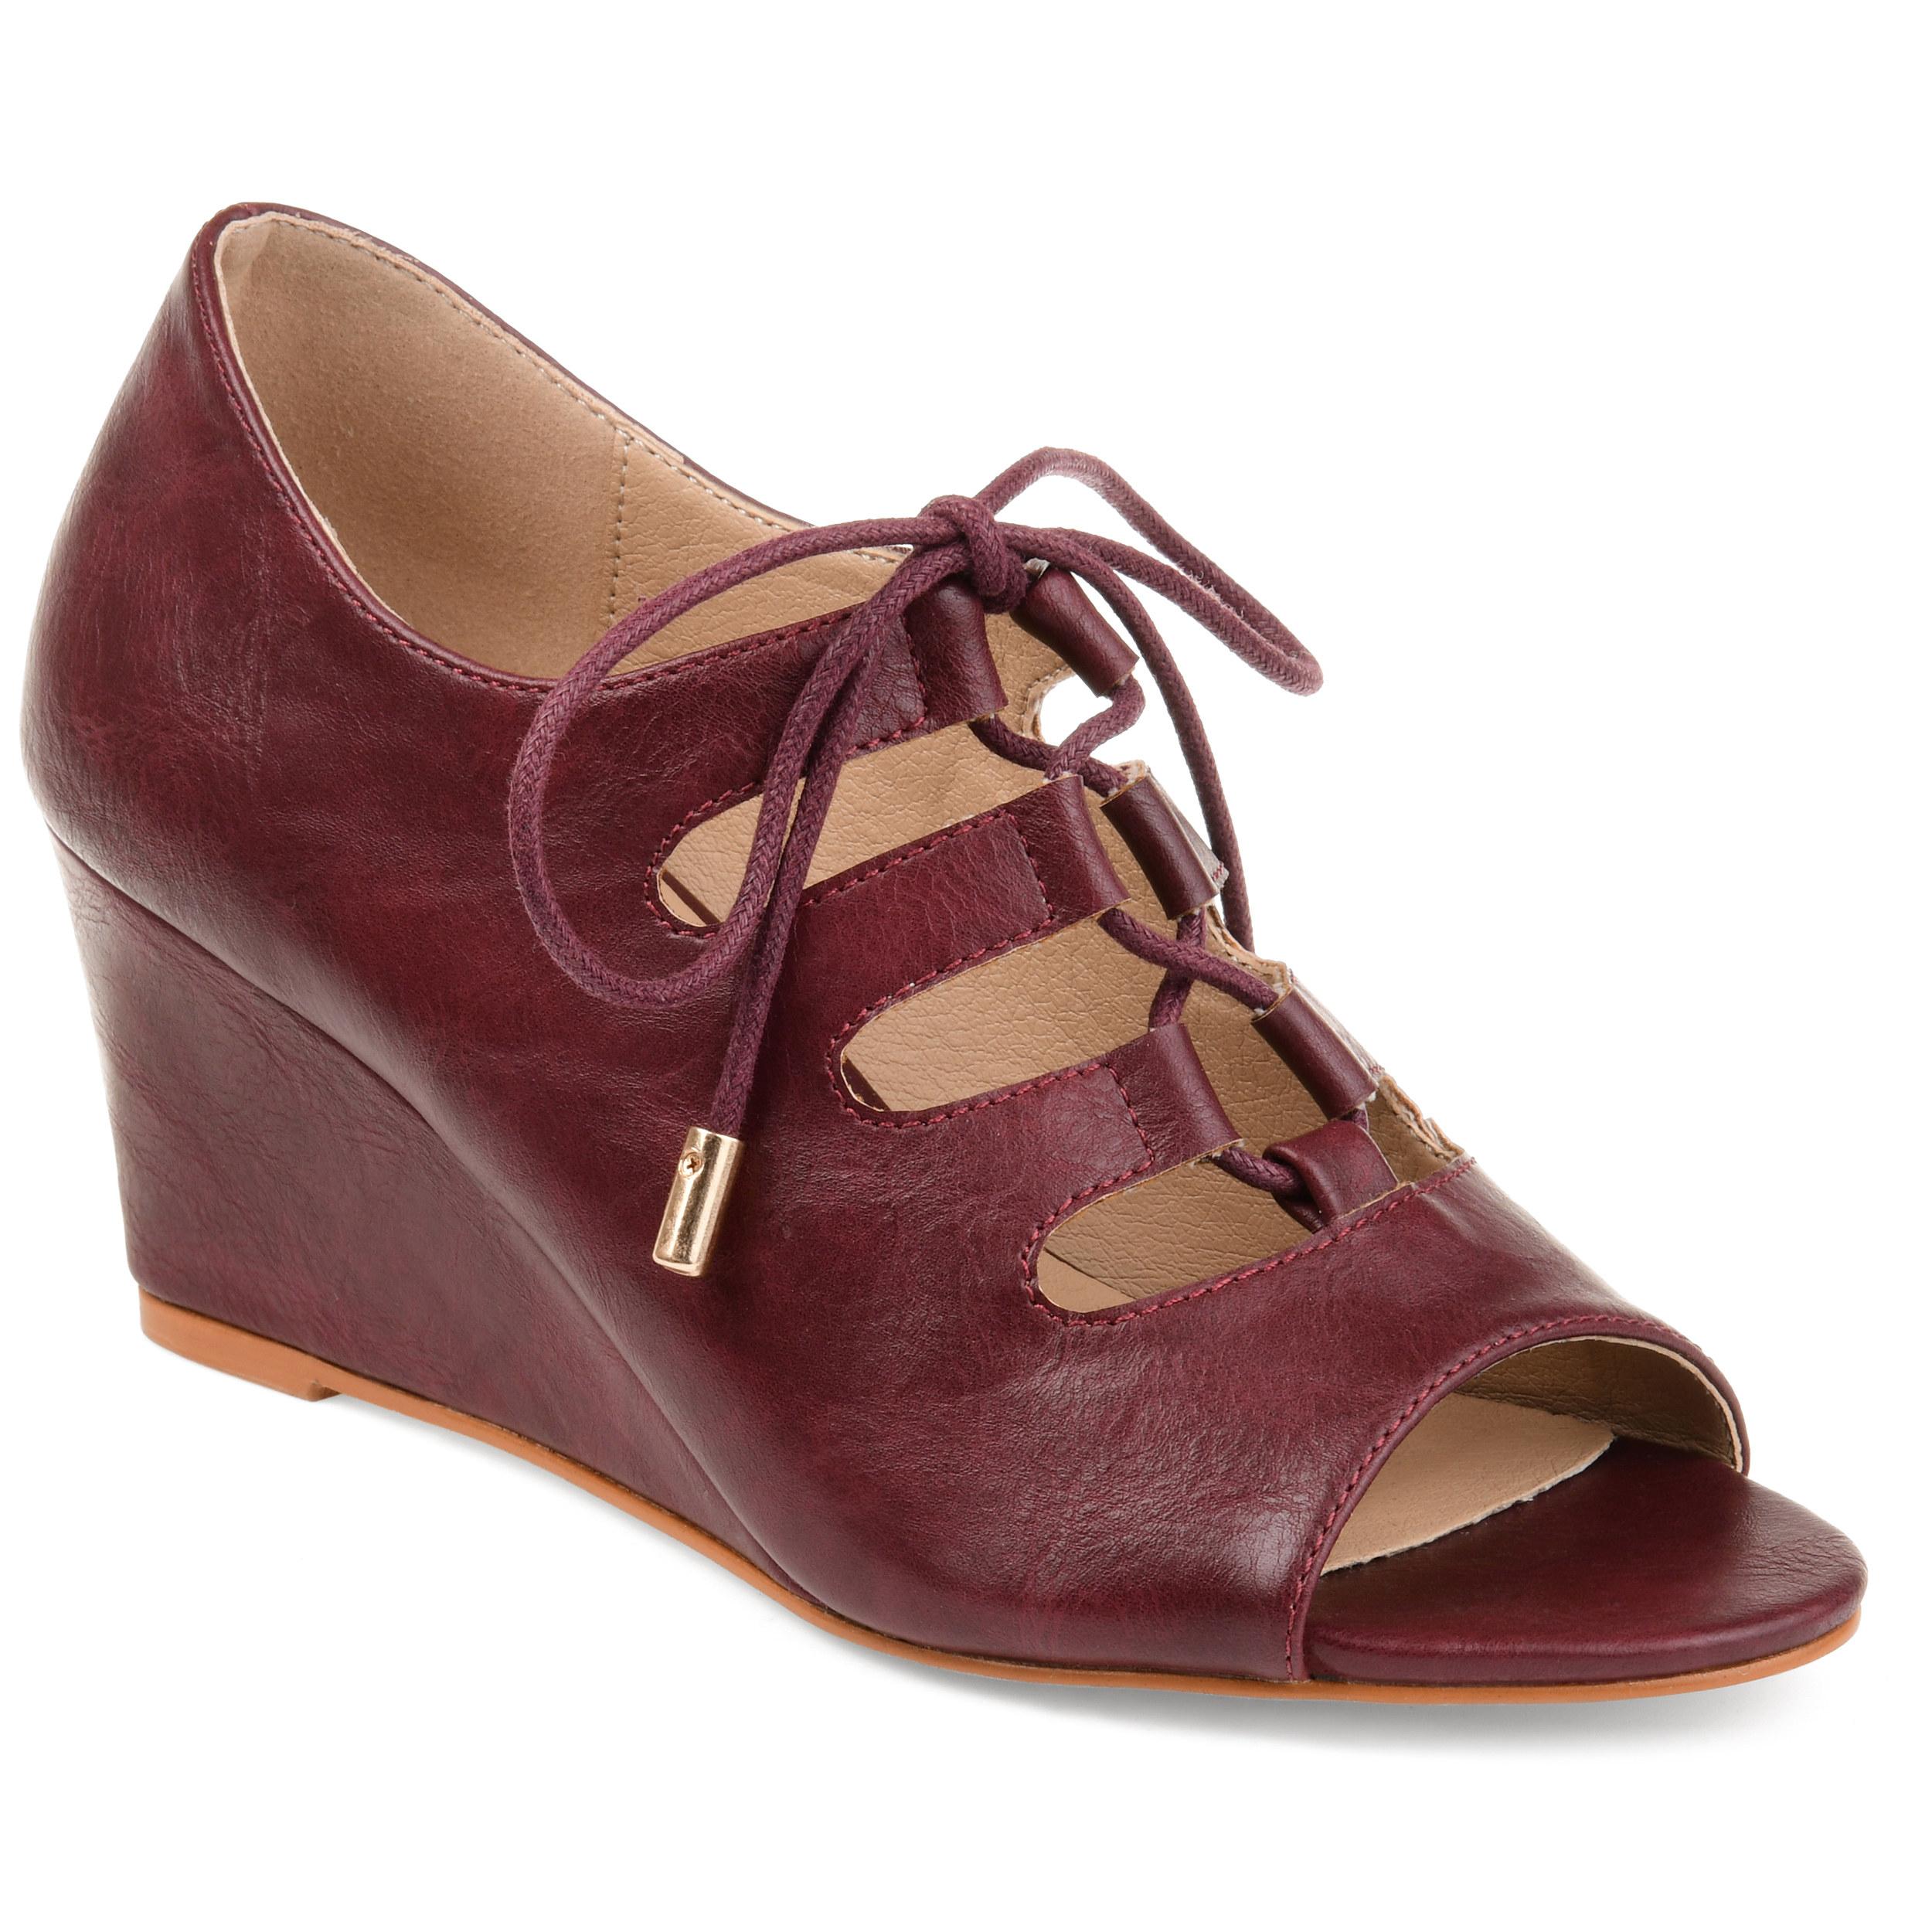 dark bergundy lace-up wedge sandals